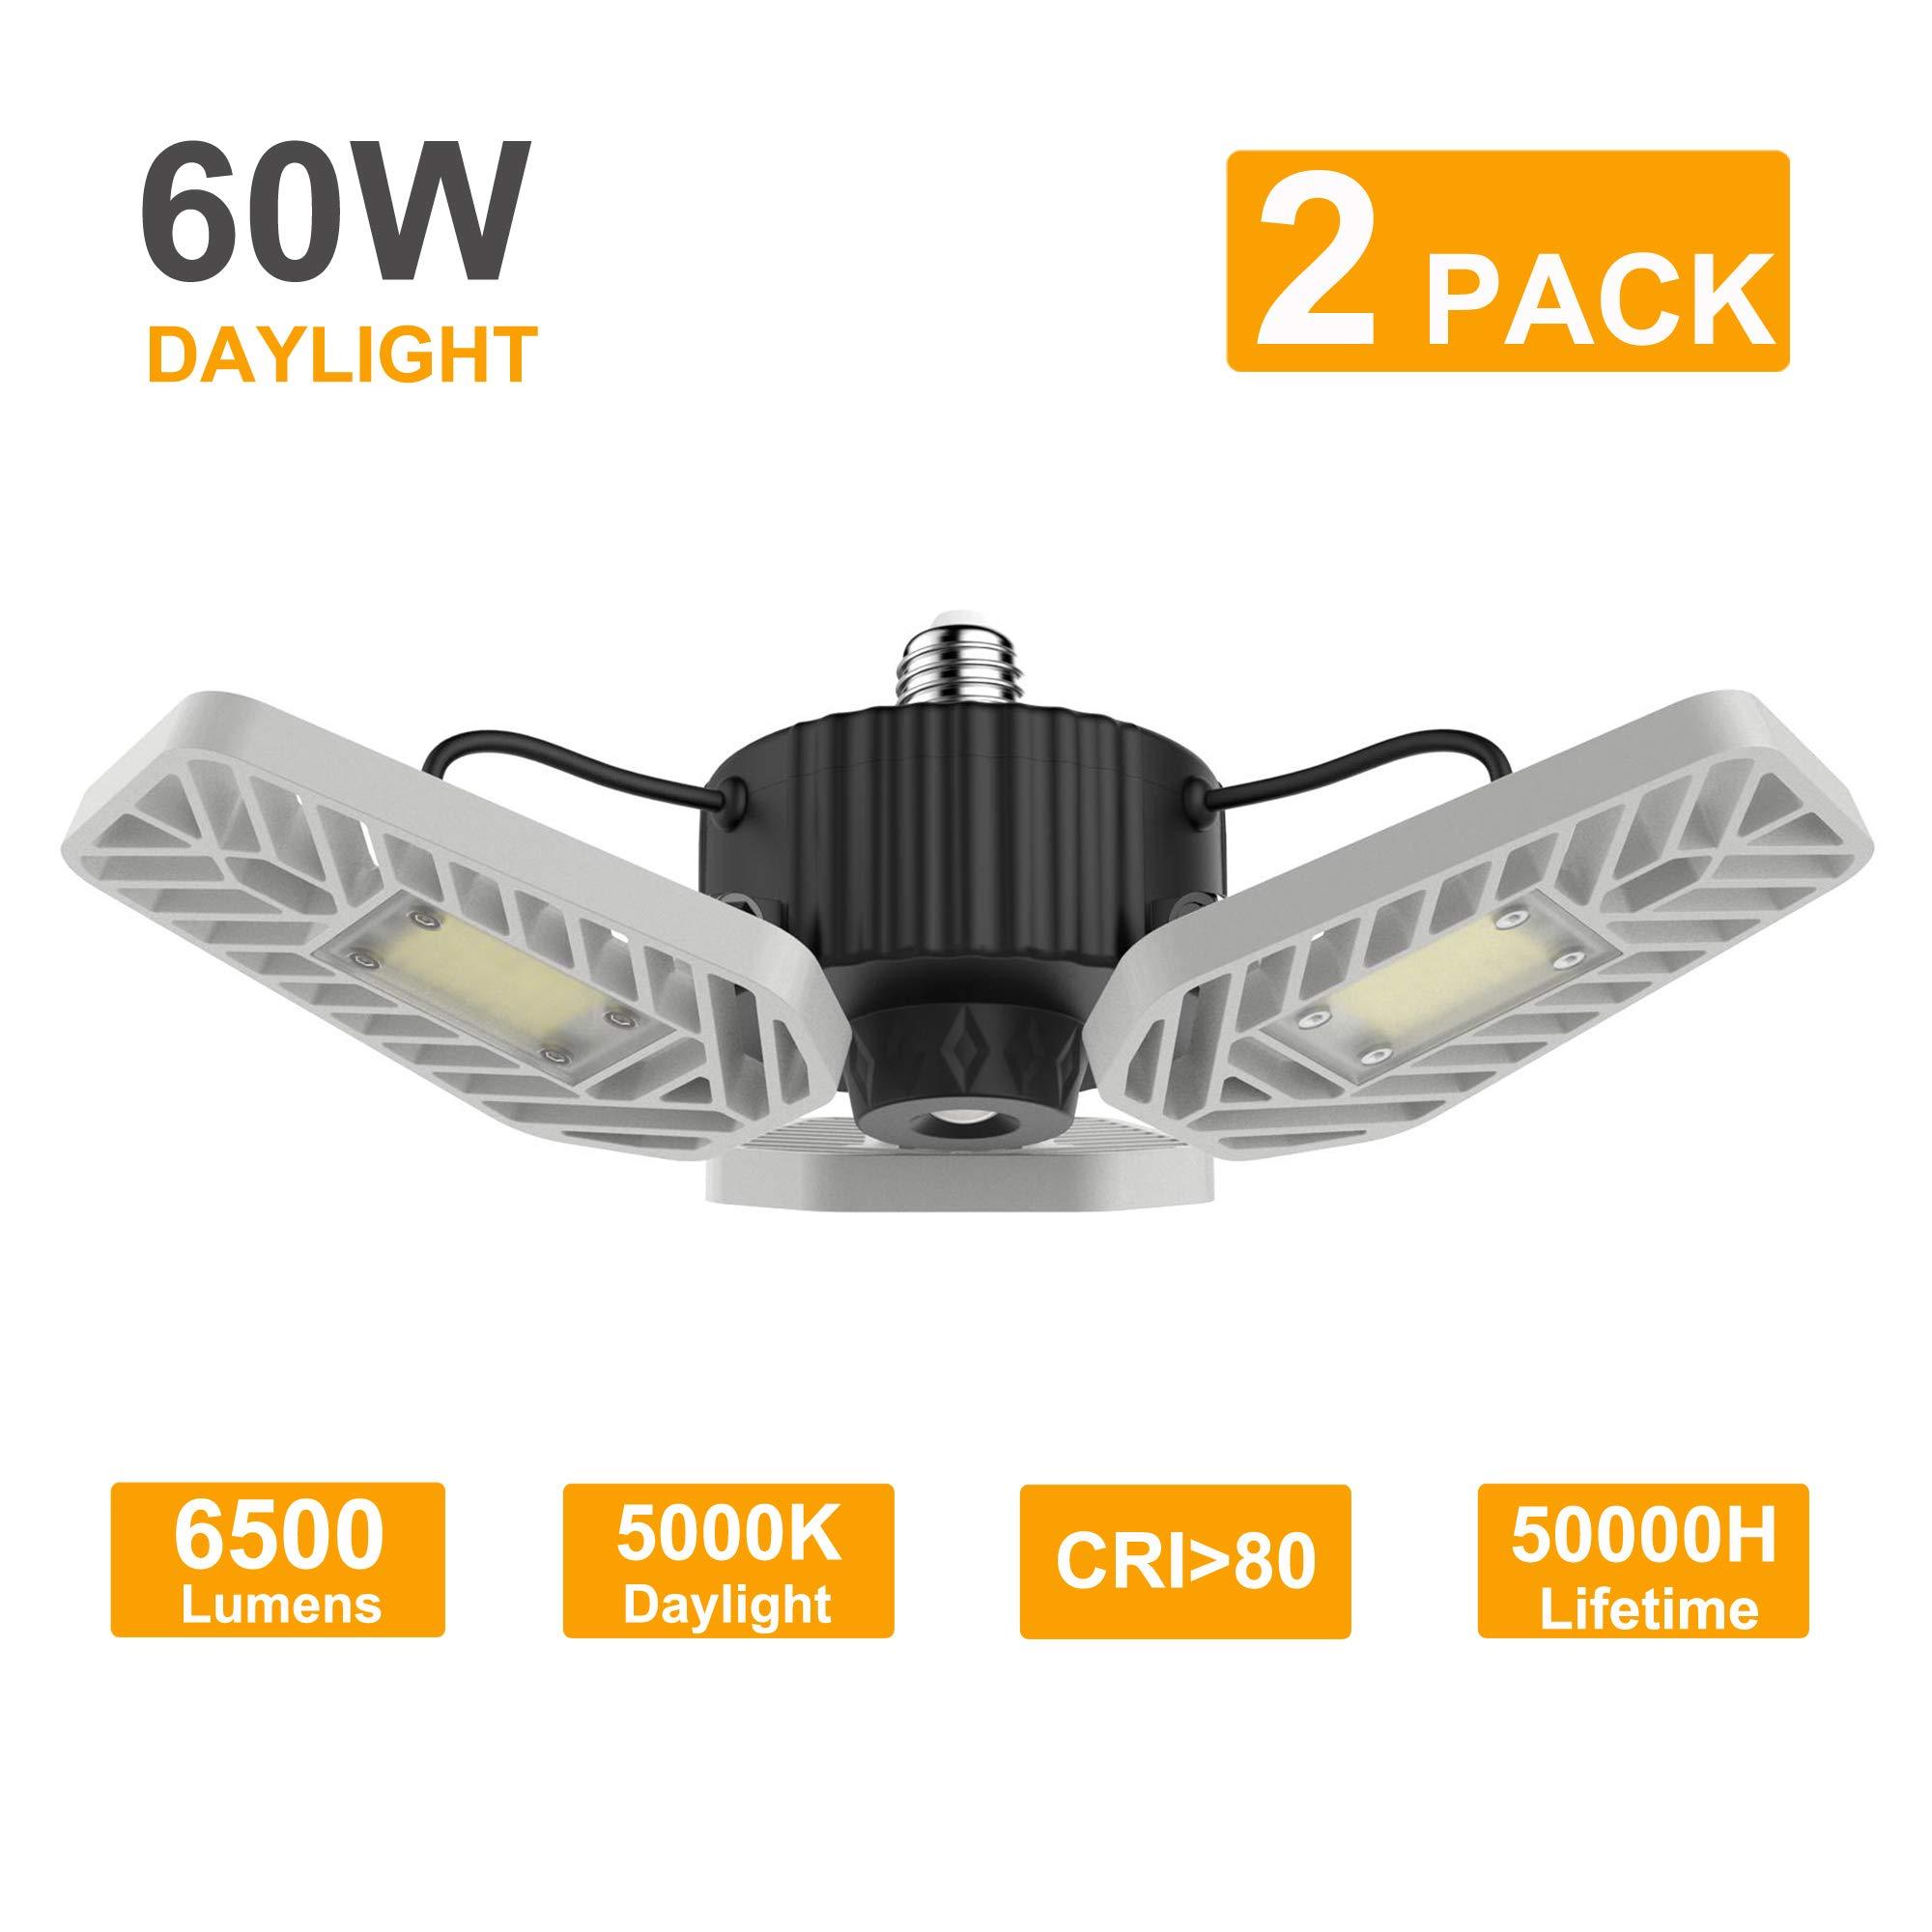 LZHOME 2-PACK LED Garage Lights, 6500Lumens E26/E27 Adjustable Trilights Garage Ceiling Light ,60W LED Garage Light, CRI…